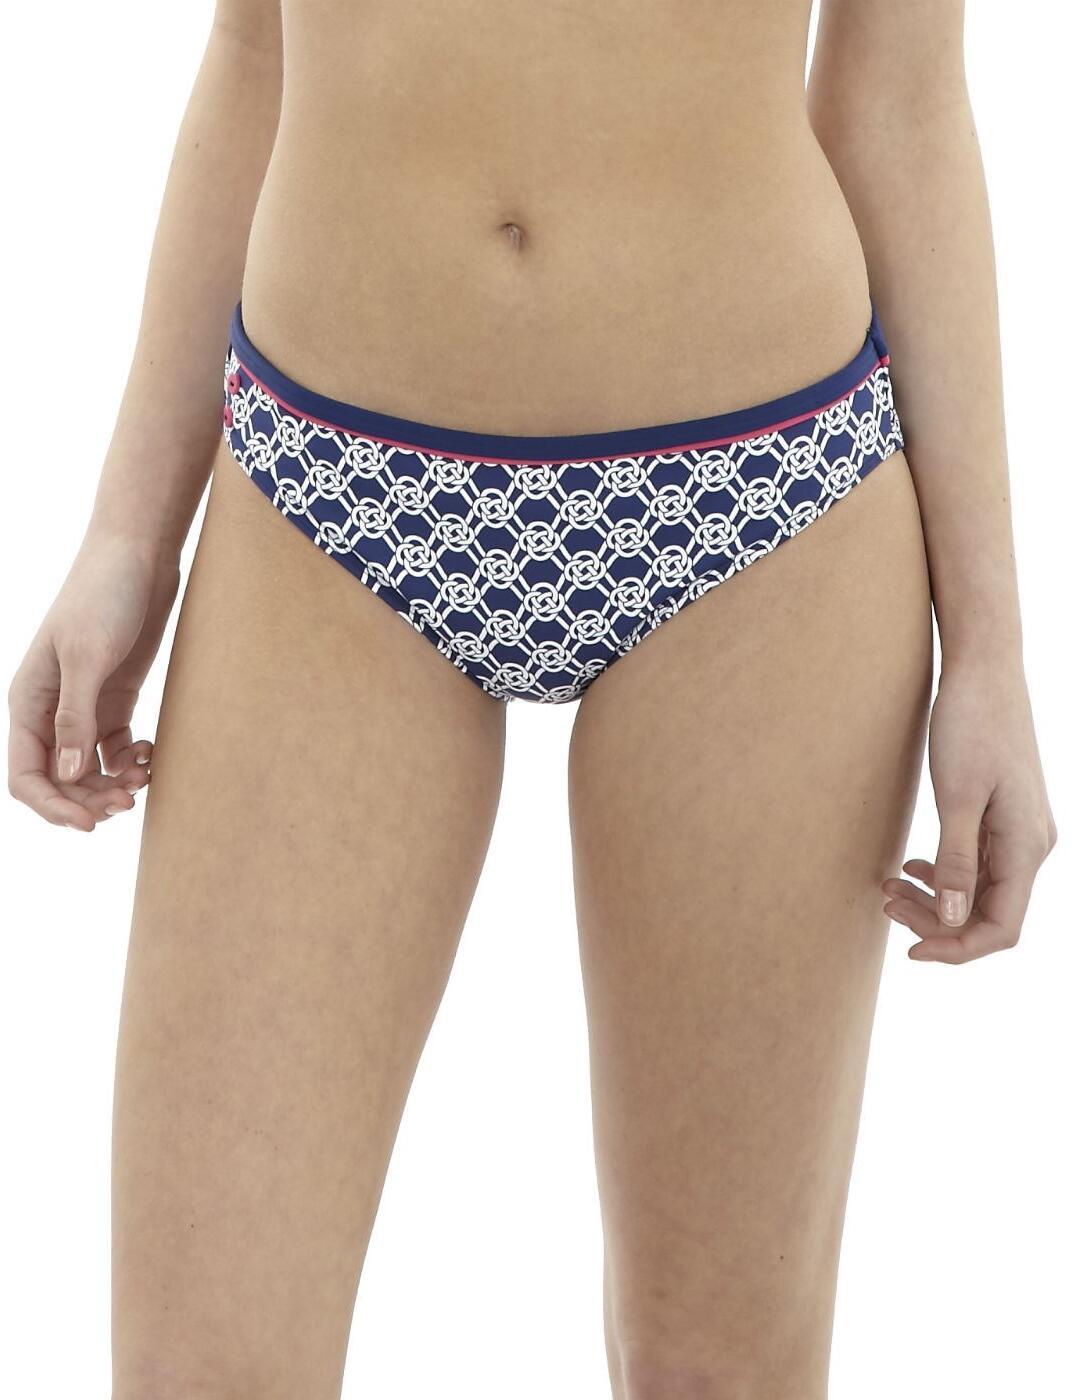 CW0279 Cleo by Panache Lucille Classic Bikini Brief - CW0279 Bikini Brief